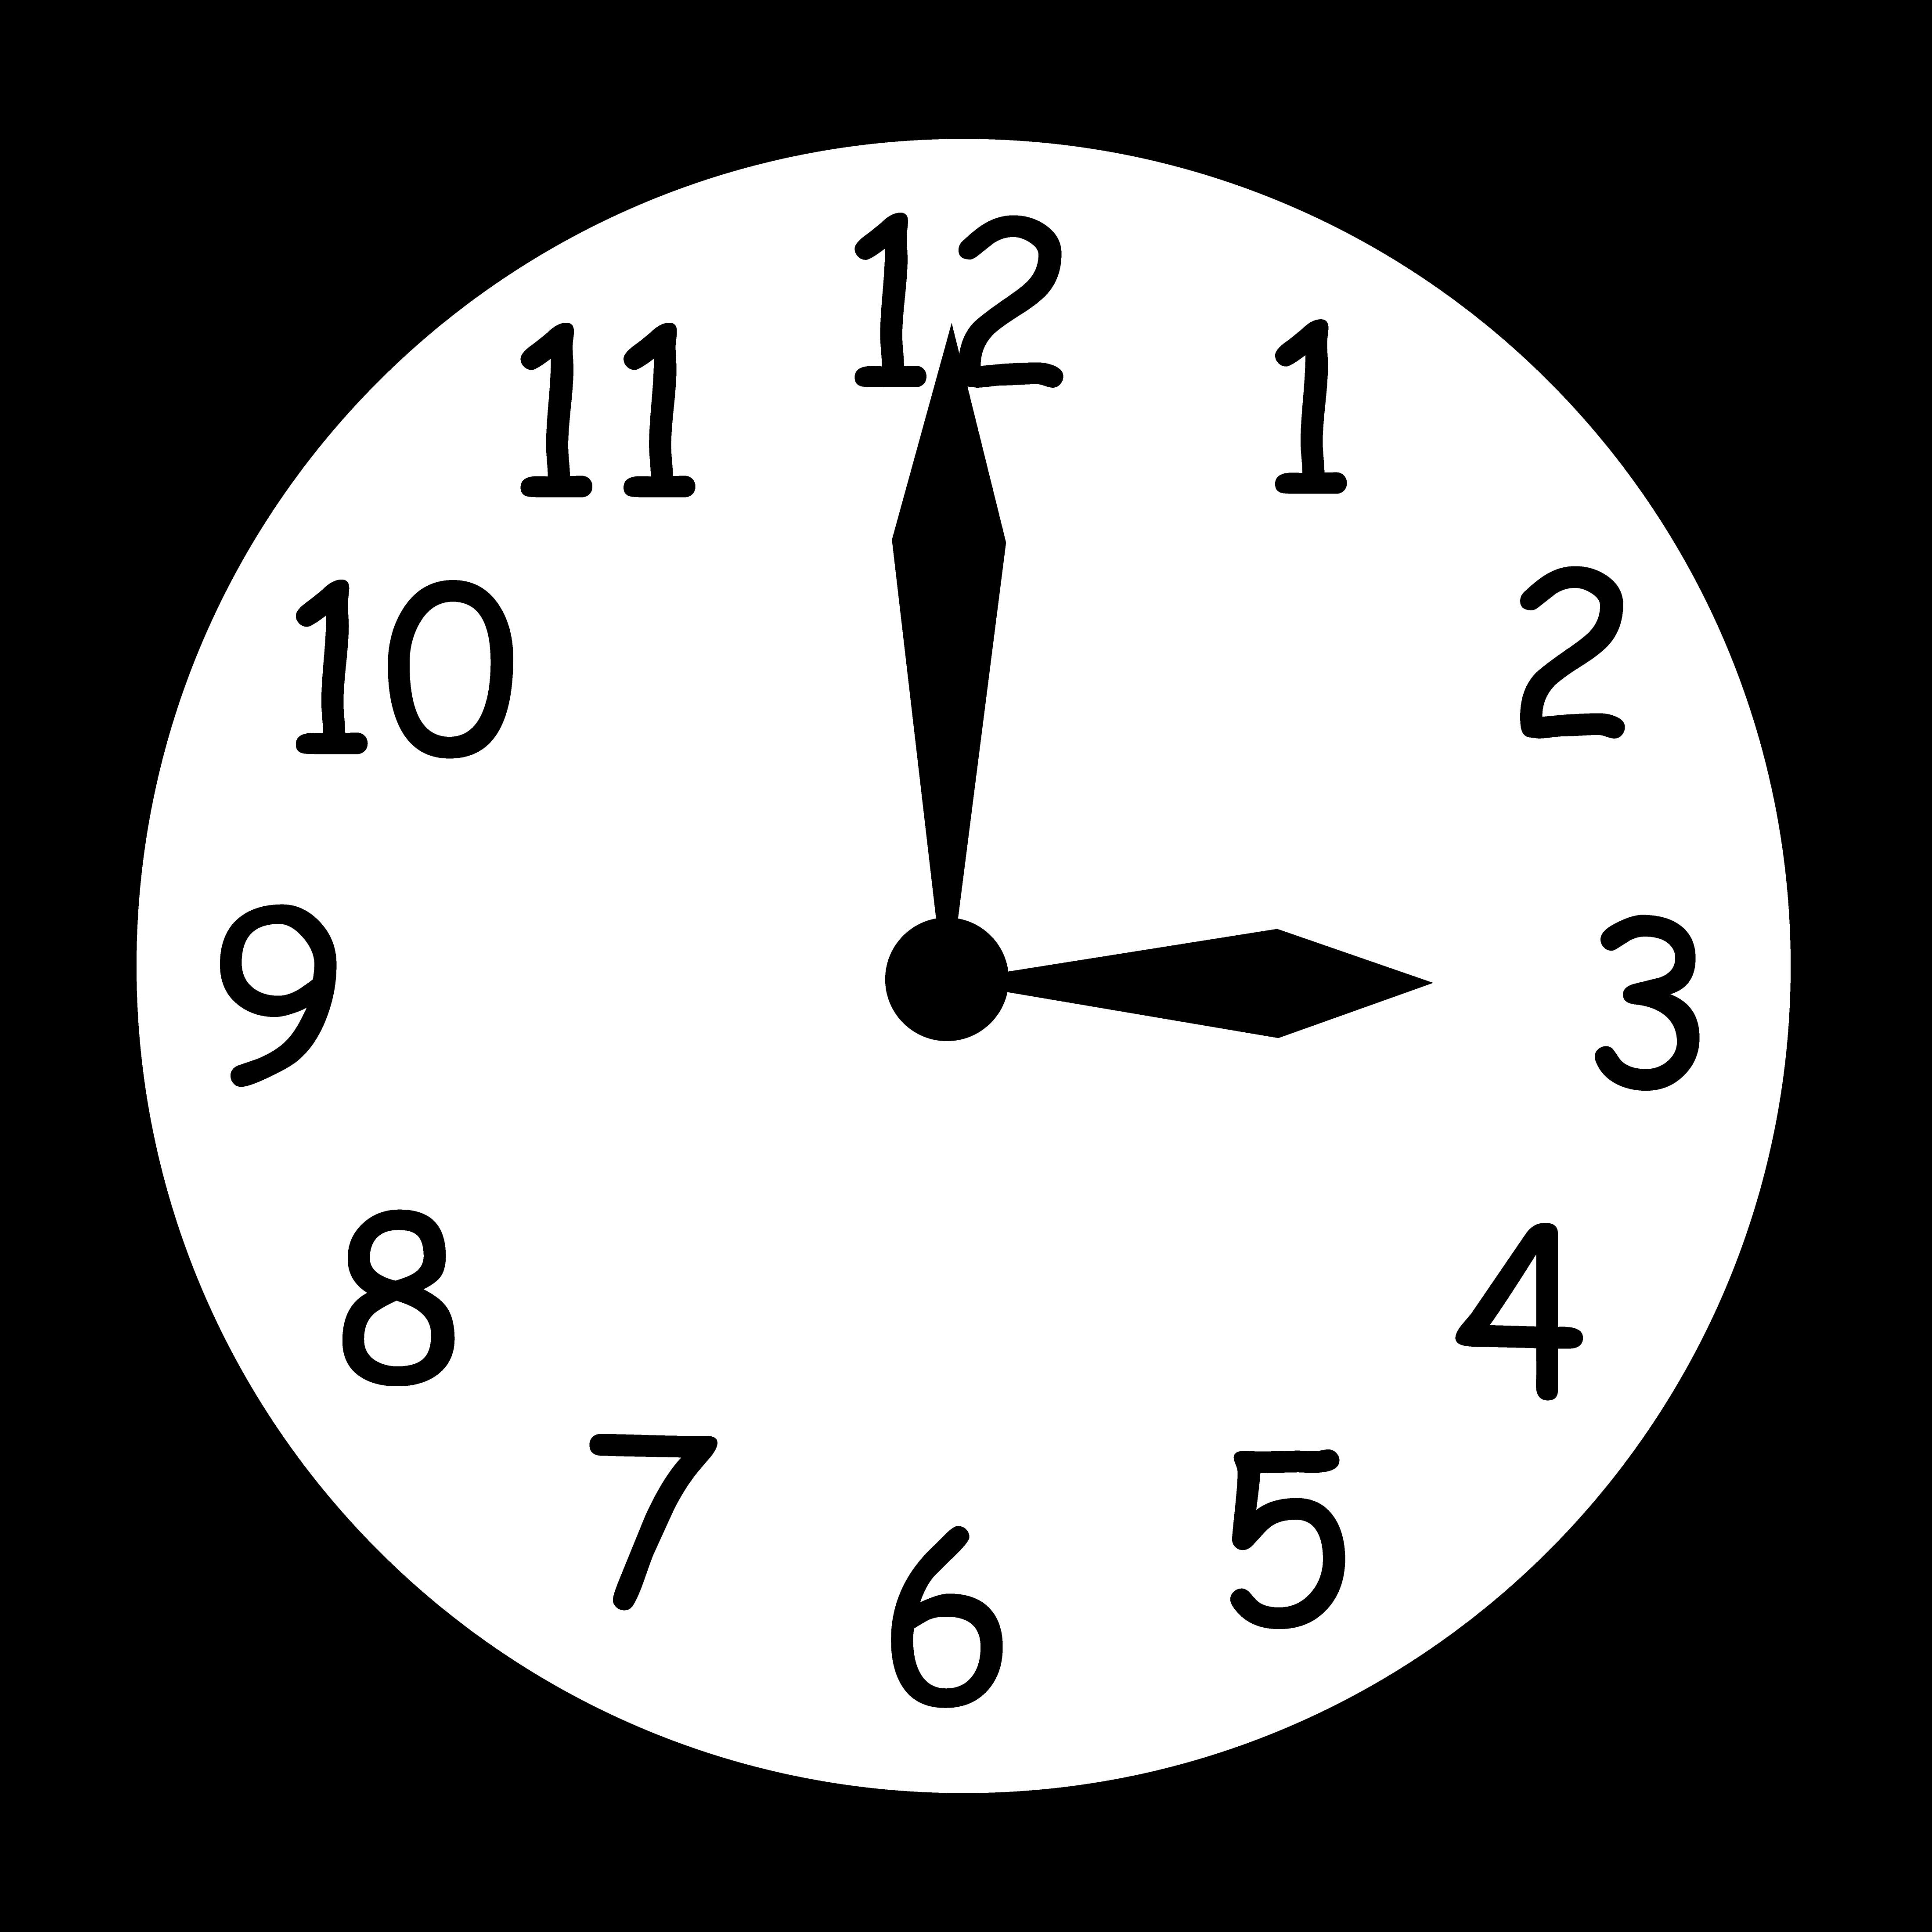 analog clock image clipart clipart panda free clipart images rh clipartpanda com analog clock clipart for teachers clip art analog clock to minute